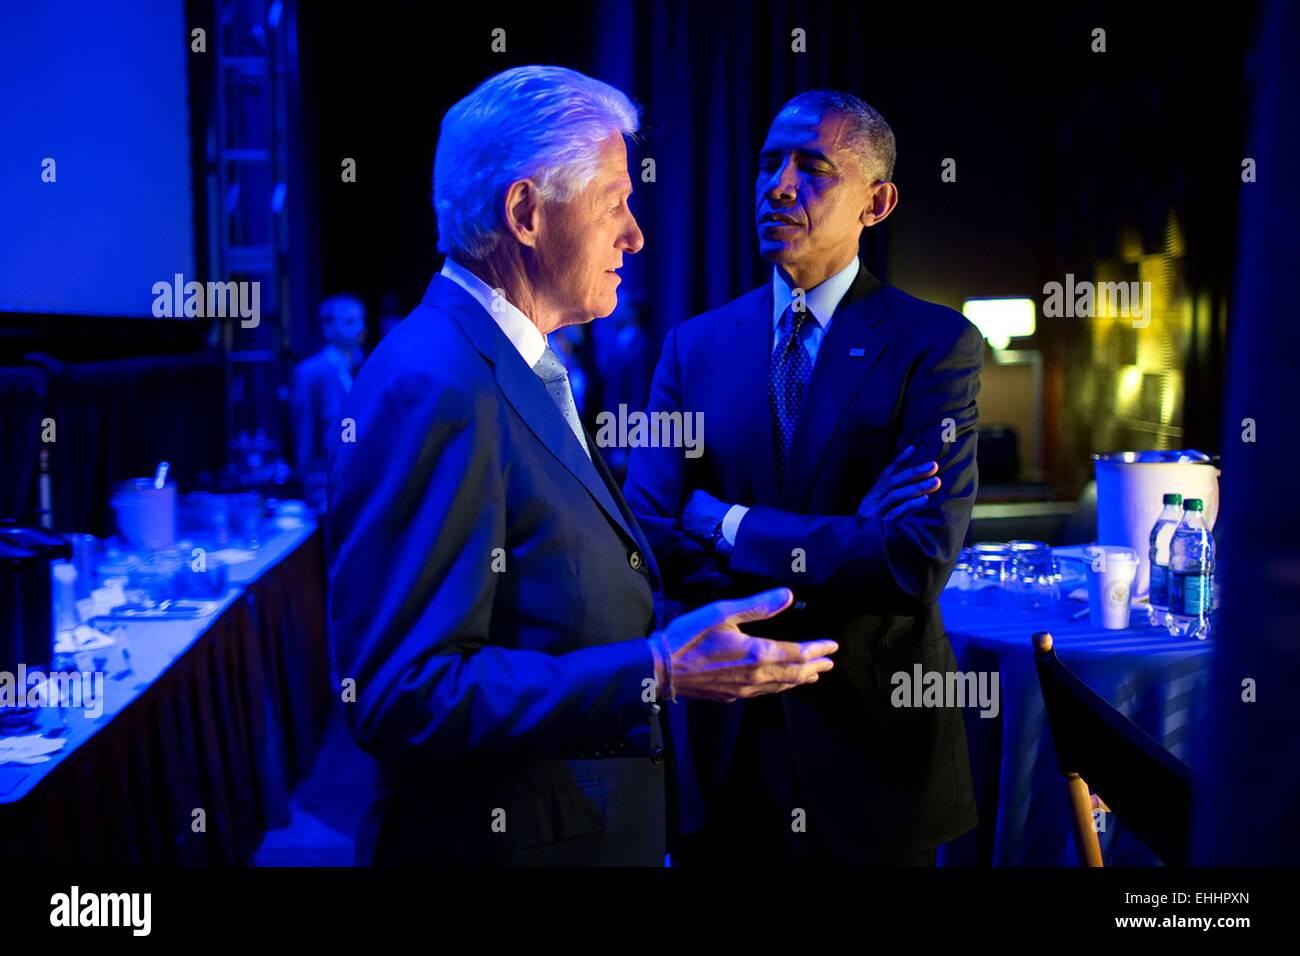 US President Barack Obama speaks with former President Bill Clinton backstage prior to delivering remarks during - Stock Image